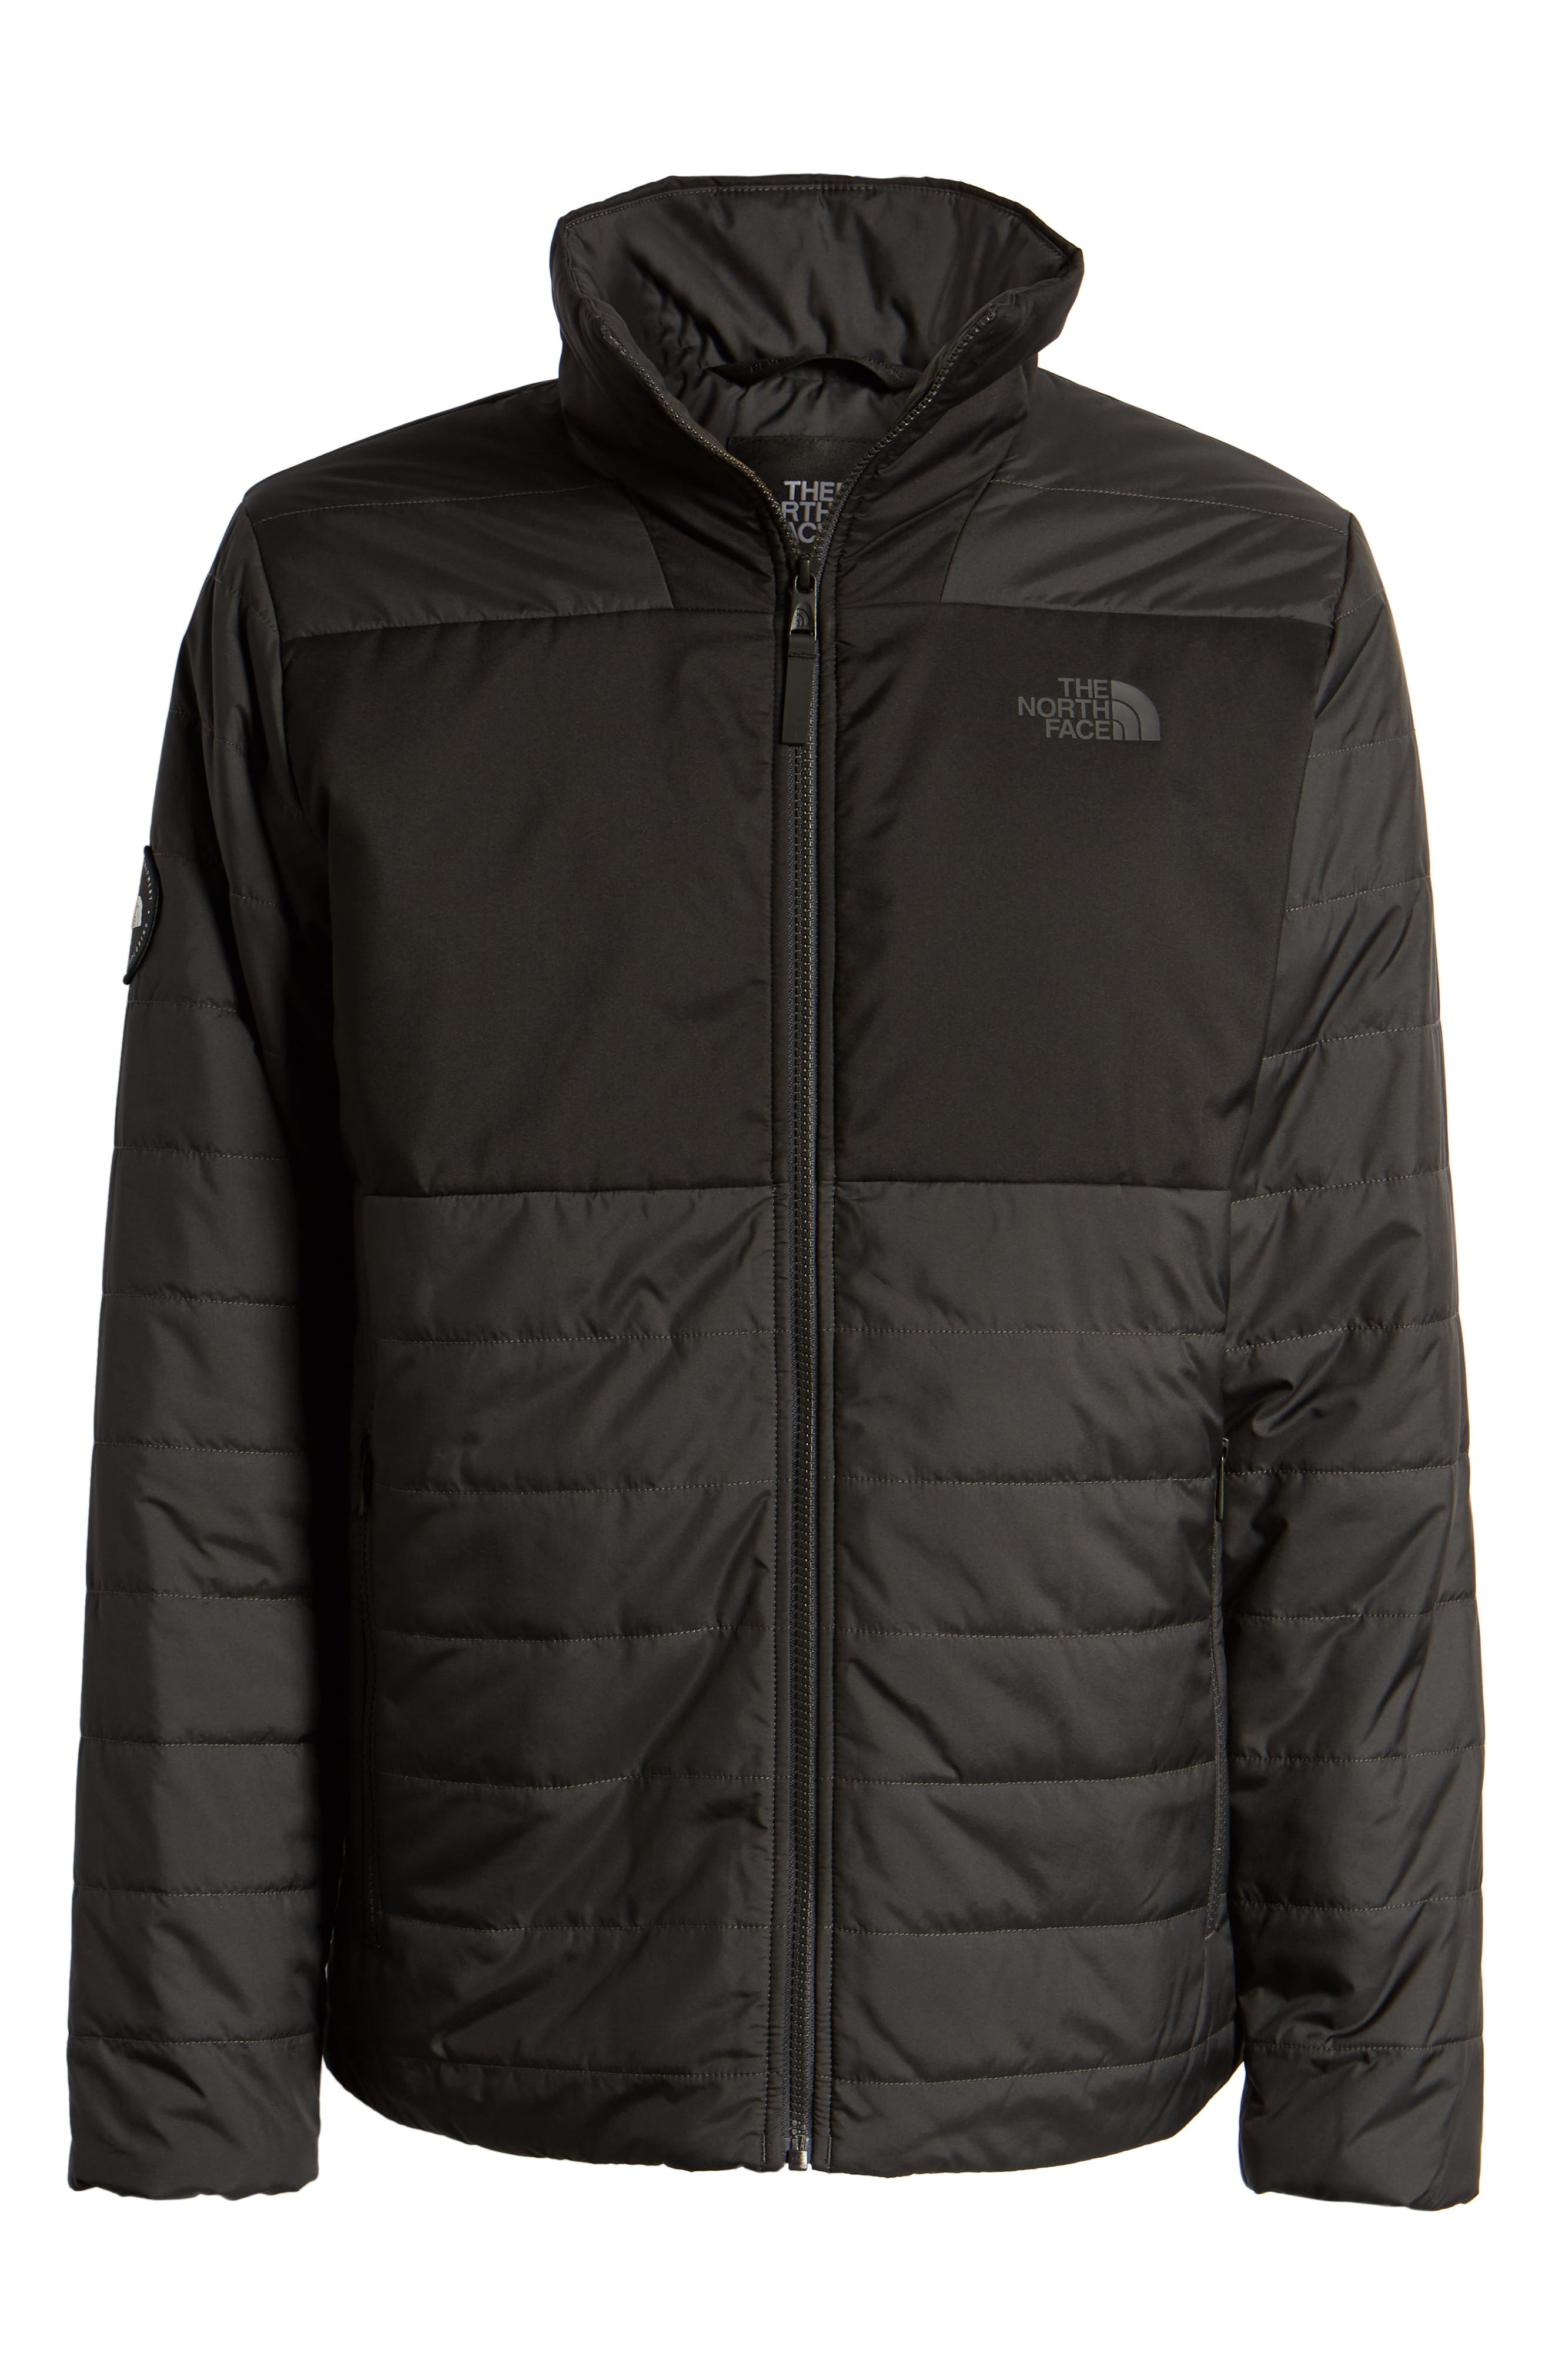 THE NORTH FACE, Insulated Jacket, Alternate thumbnail 6, color, TNF BLACK/ ASPHALT GREY